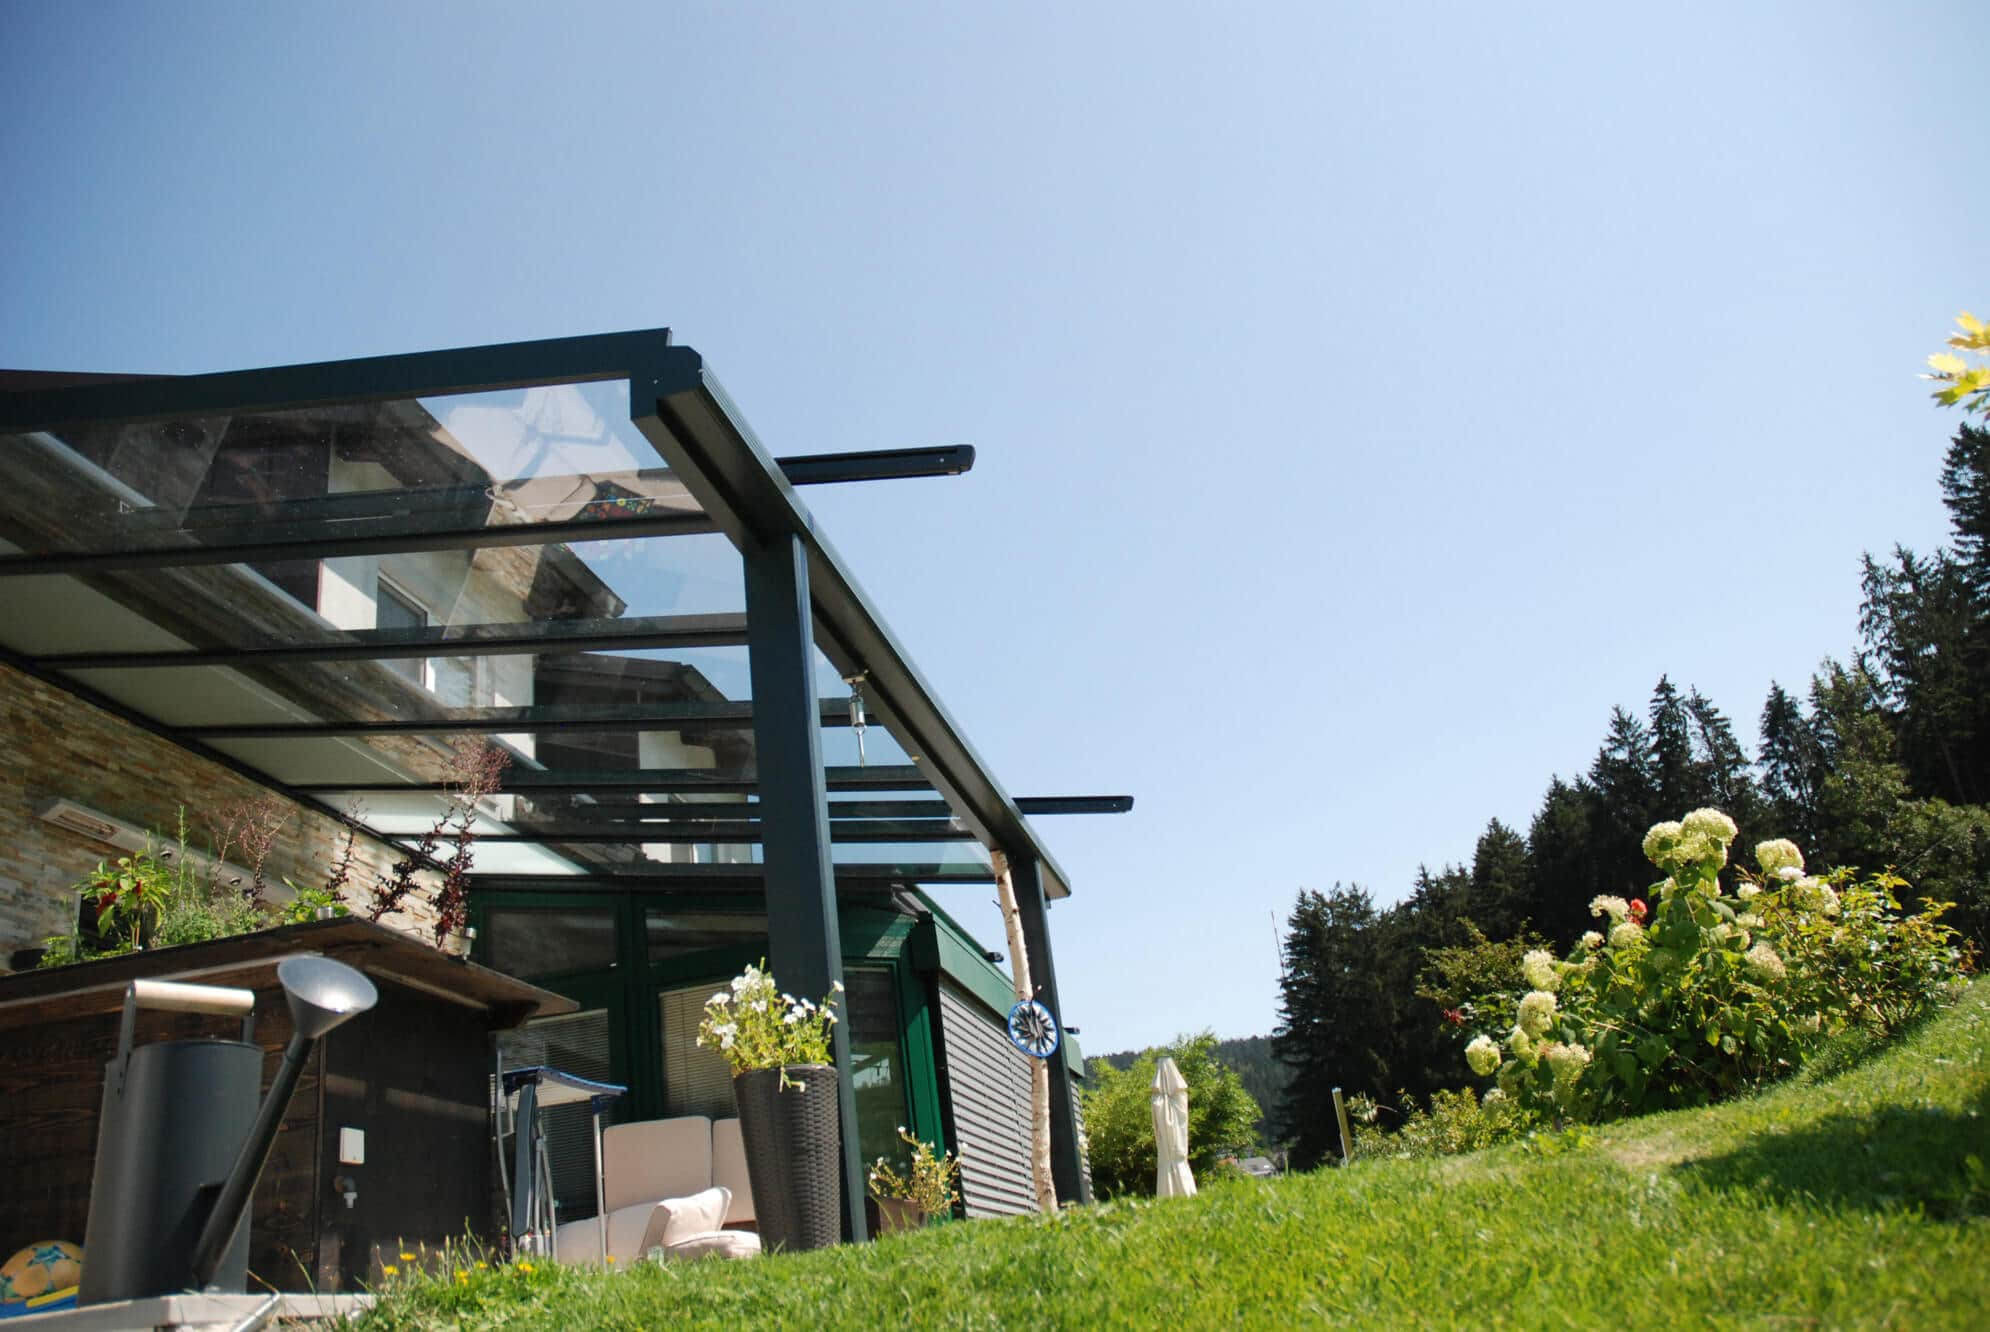 Terrassenüberdachung befestigt an Hauswand in anthrazit RAL 7016